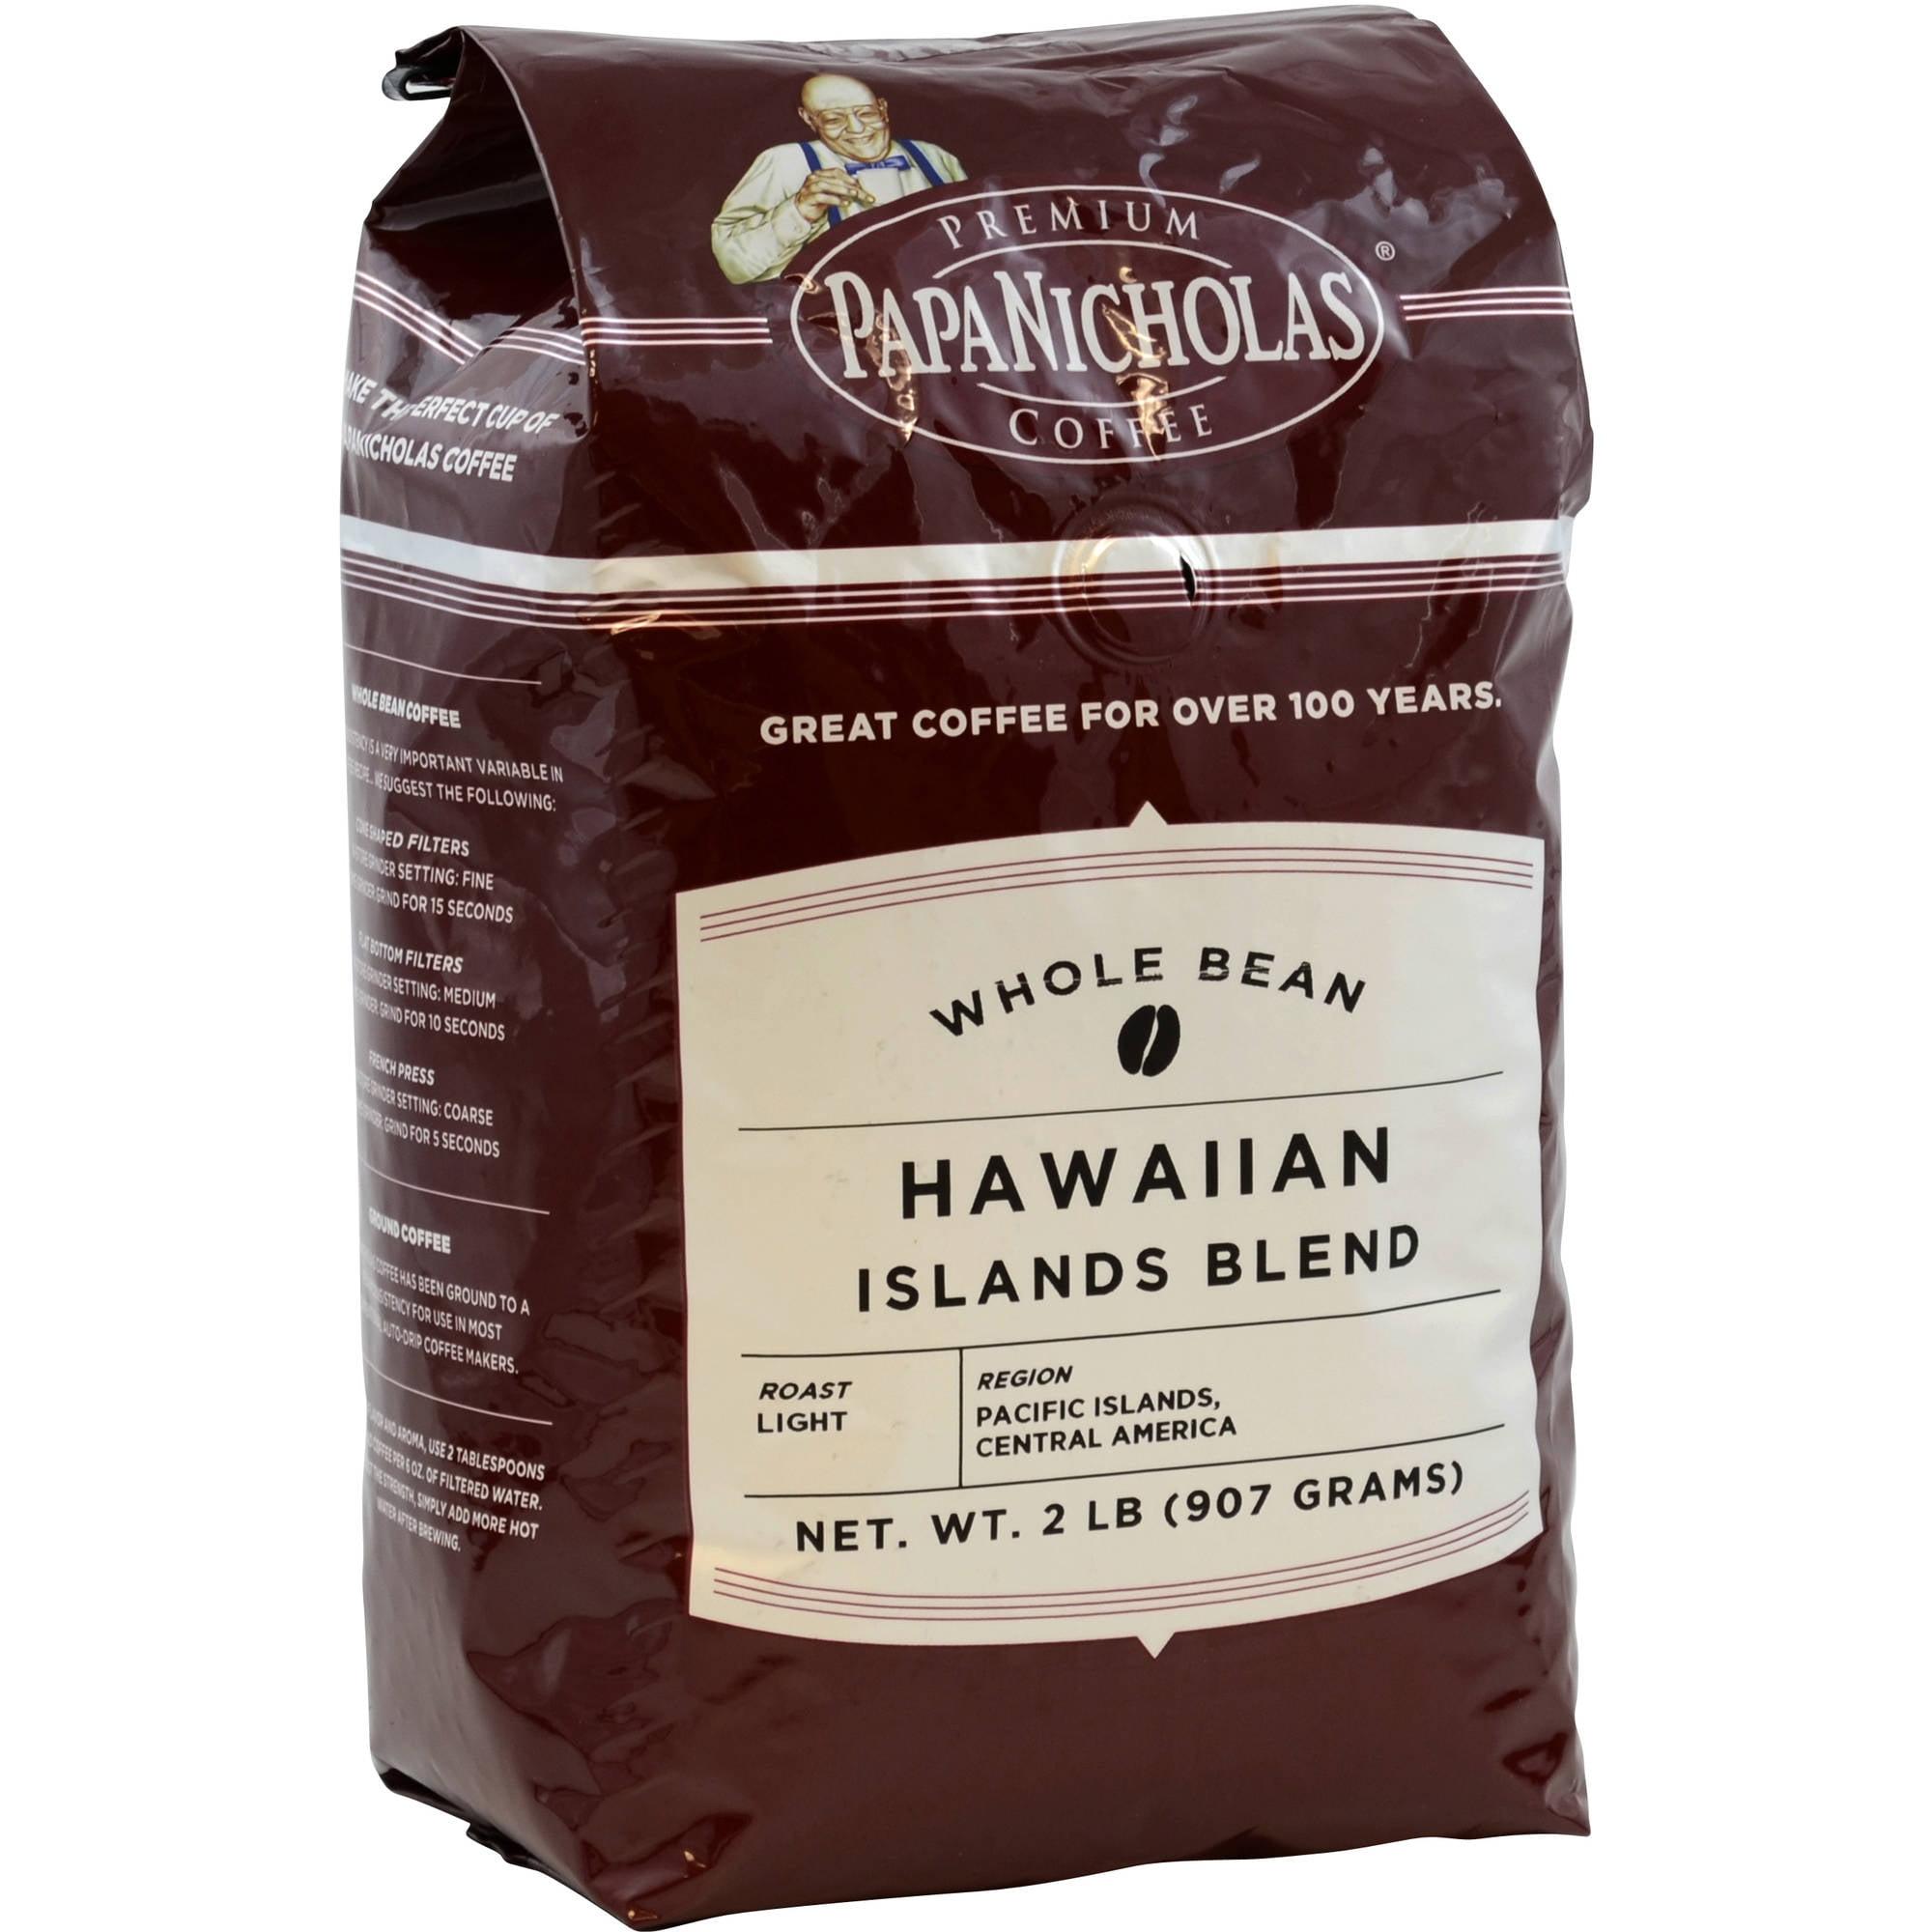 PapaNicholas Coffee Hawaiian Islands Blend Whole Bean Coffee, 2 lbs